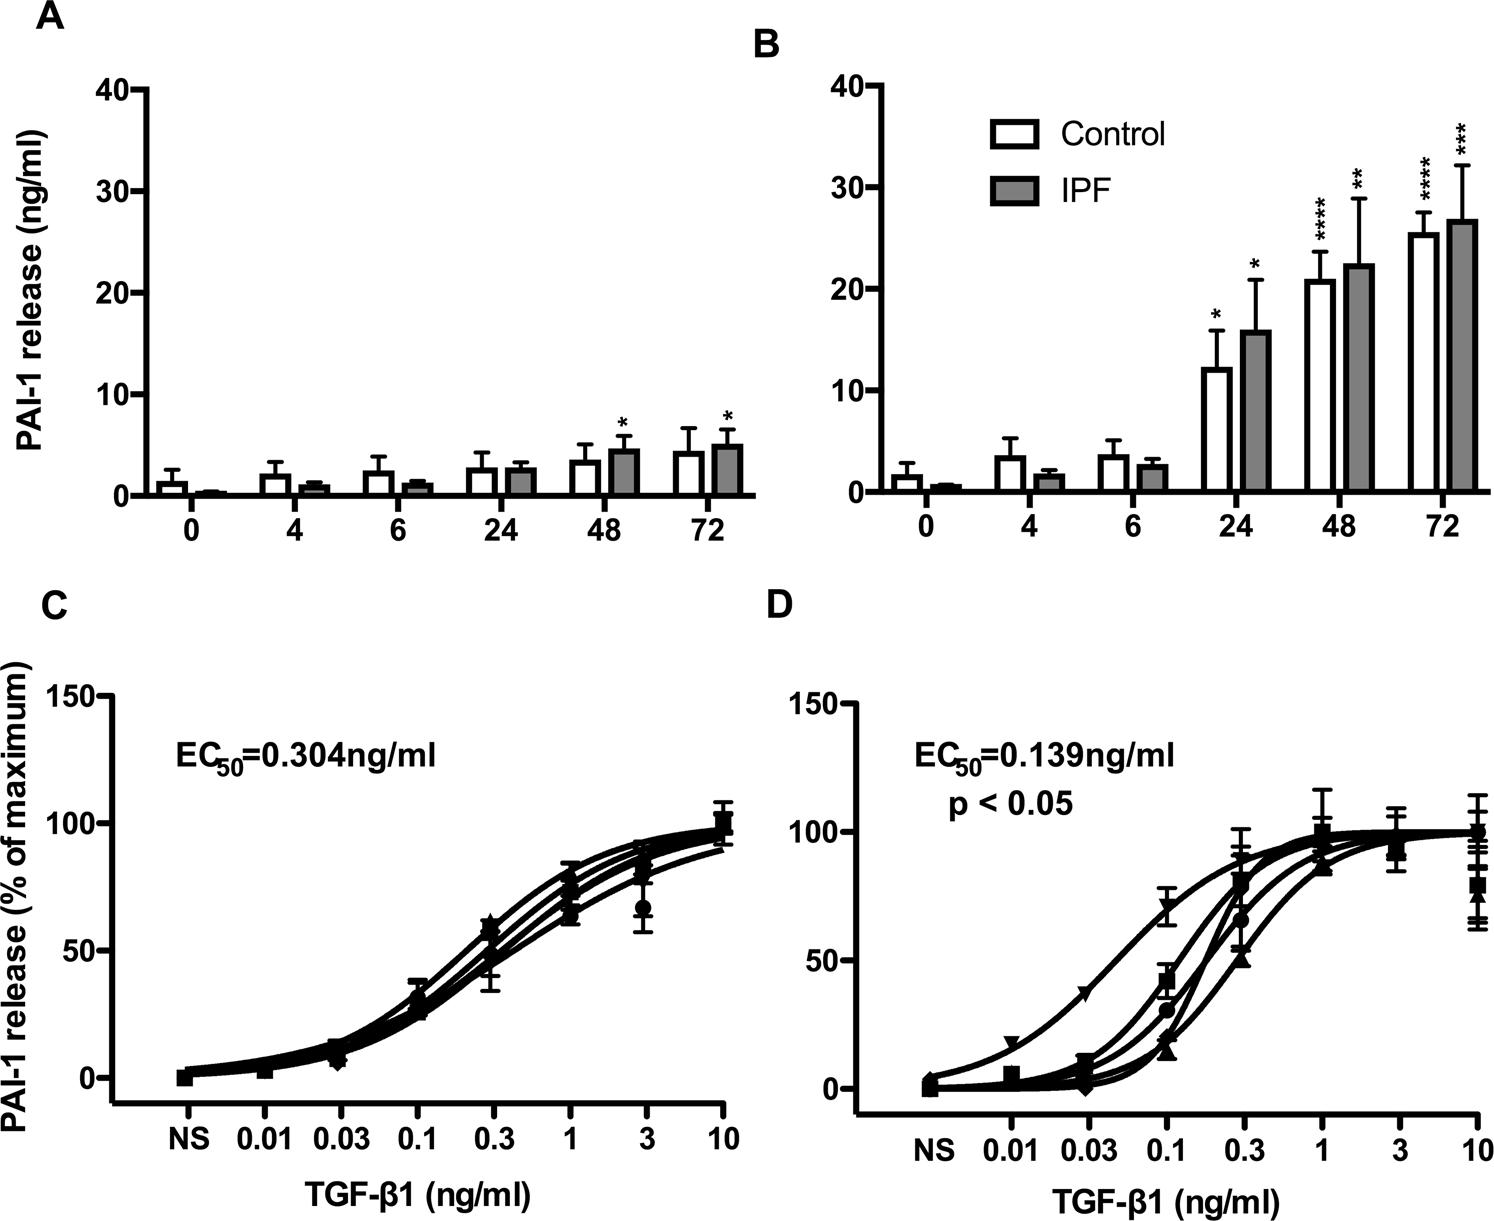 Long intergenic non-coding RNAs regulate human lung